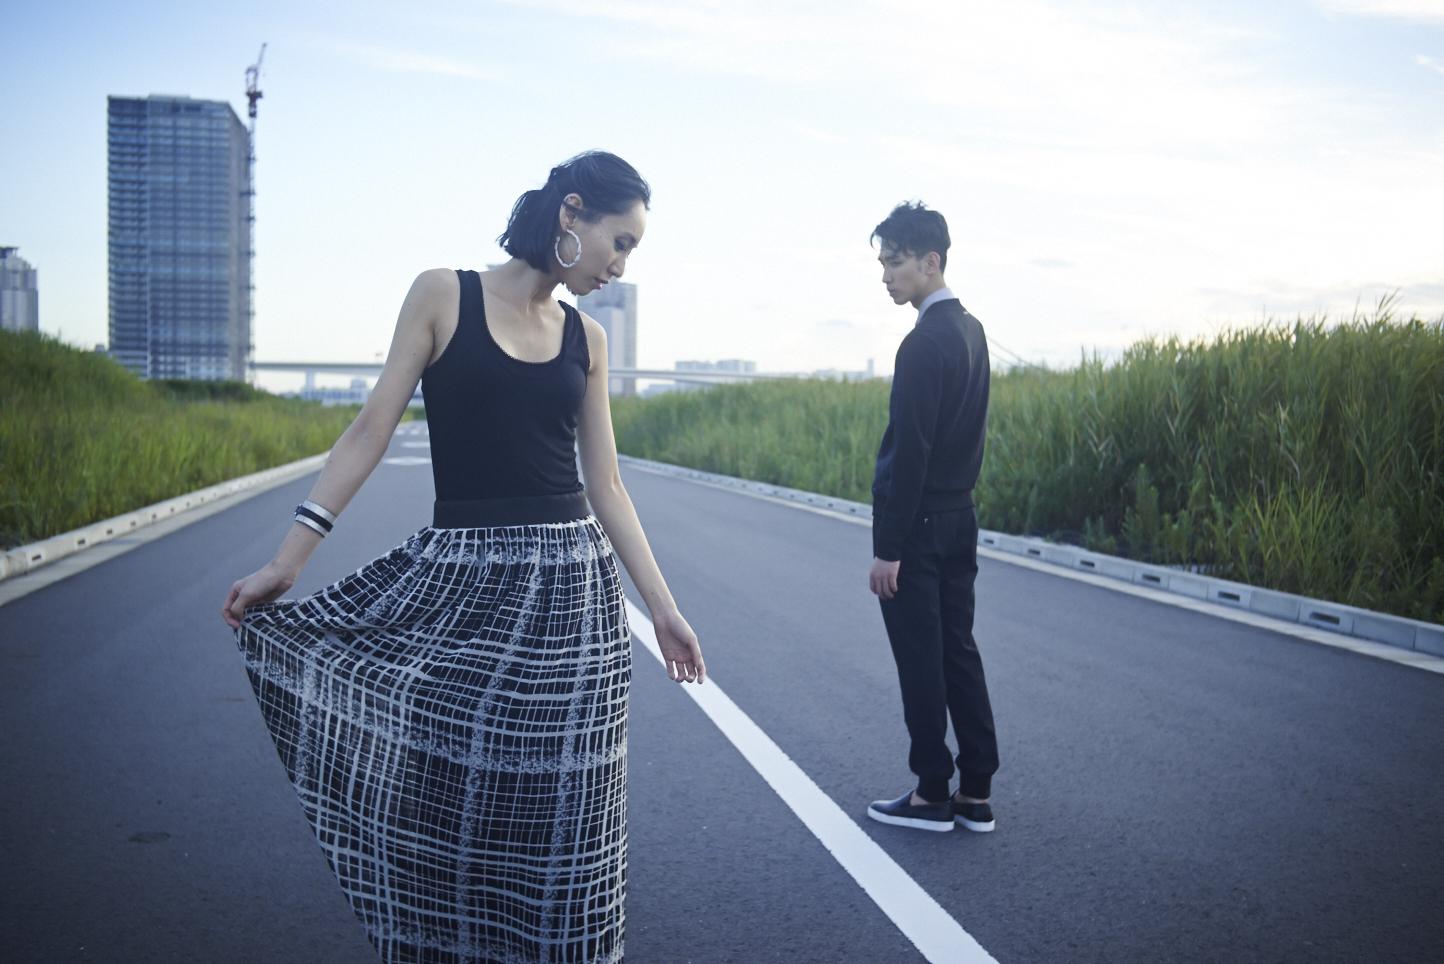 2014.08.17.style:3